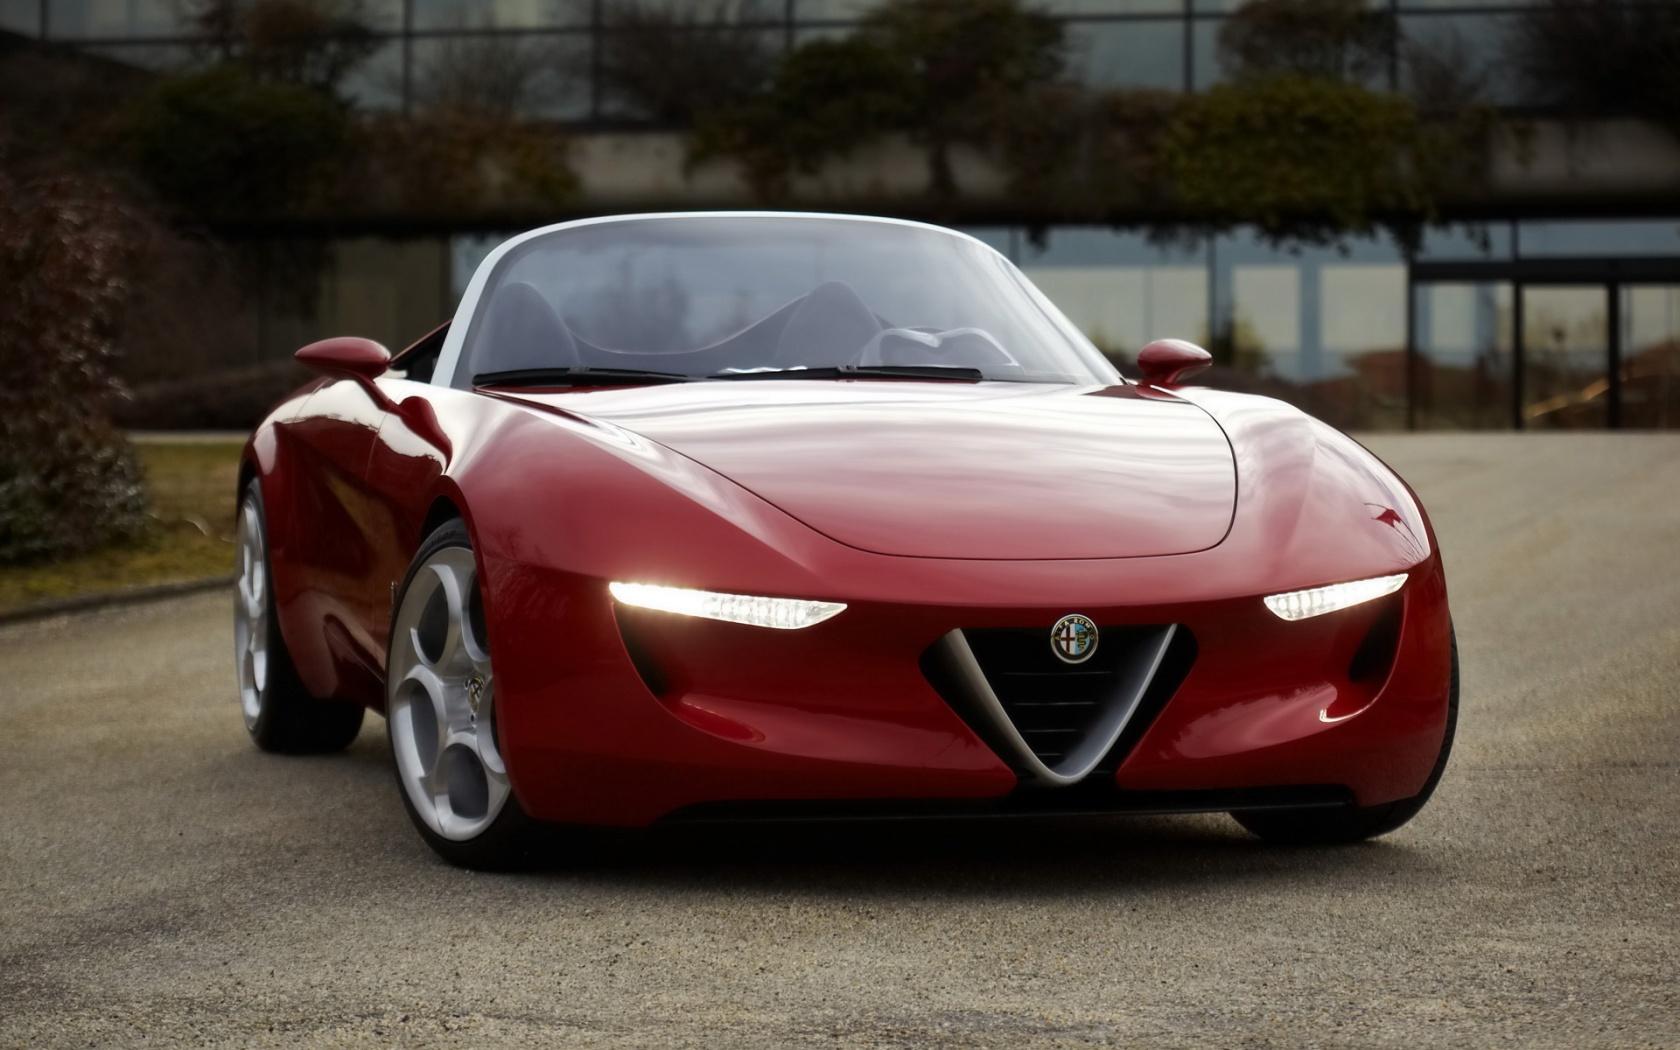 Alfa Romeo Super Car Wallpapers HD Wallpapers 1680x1050